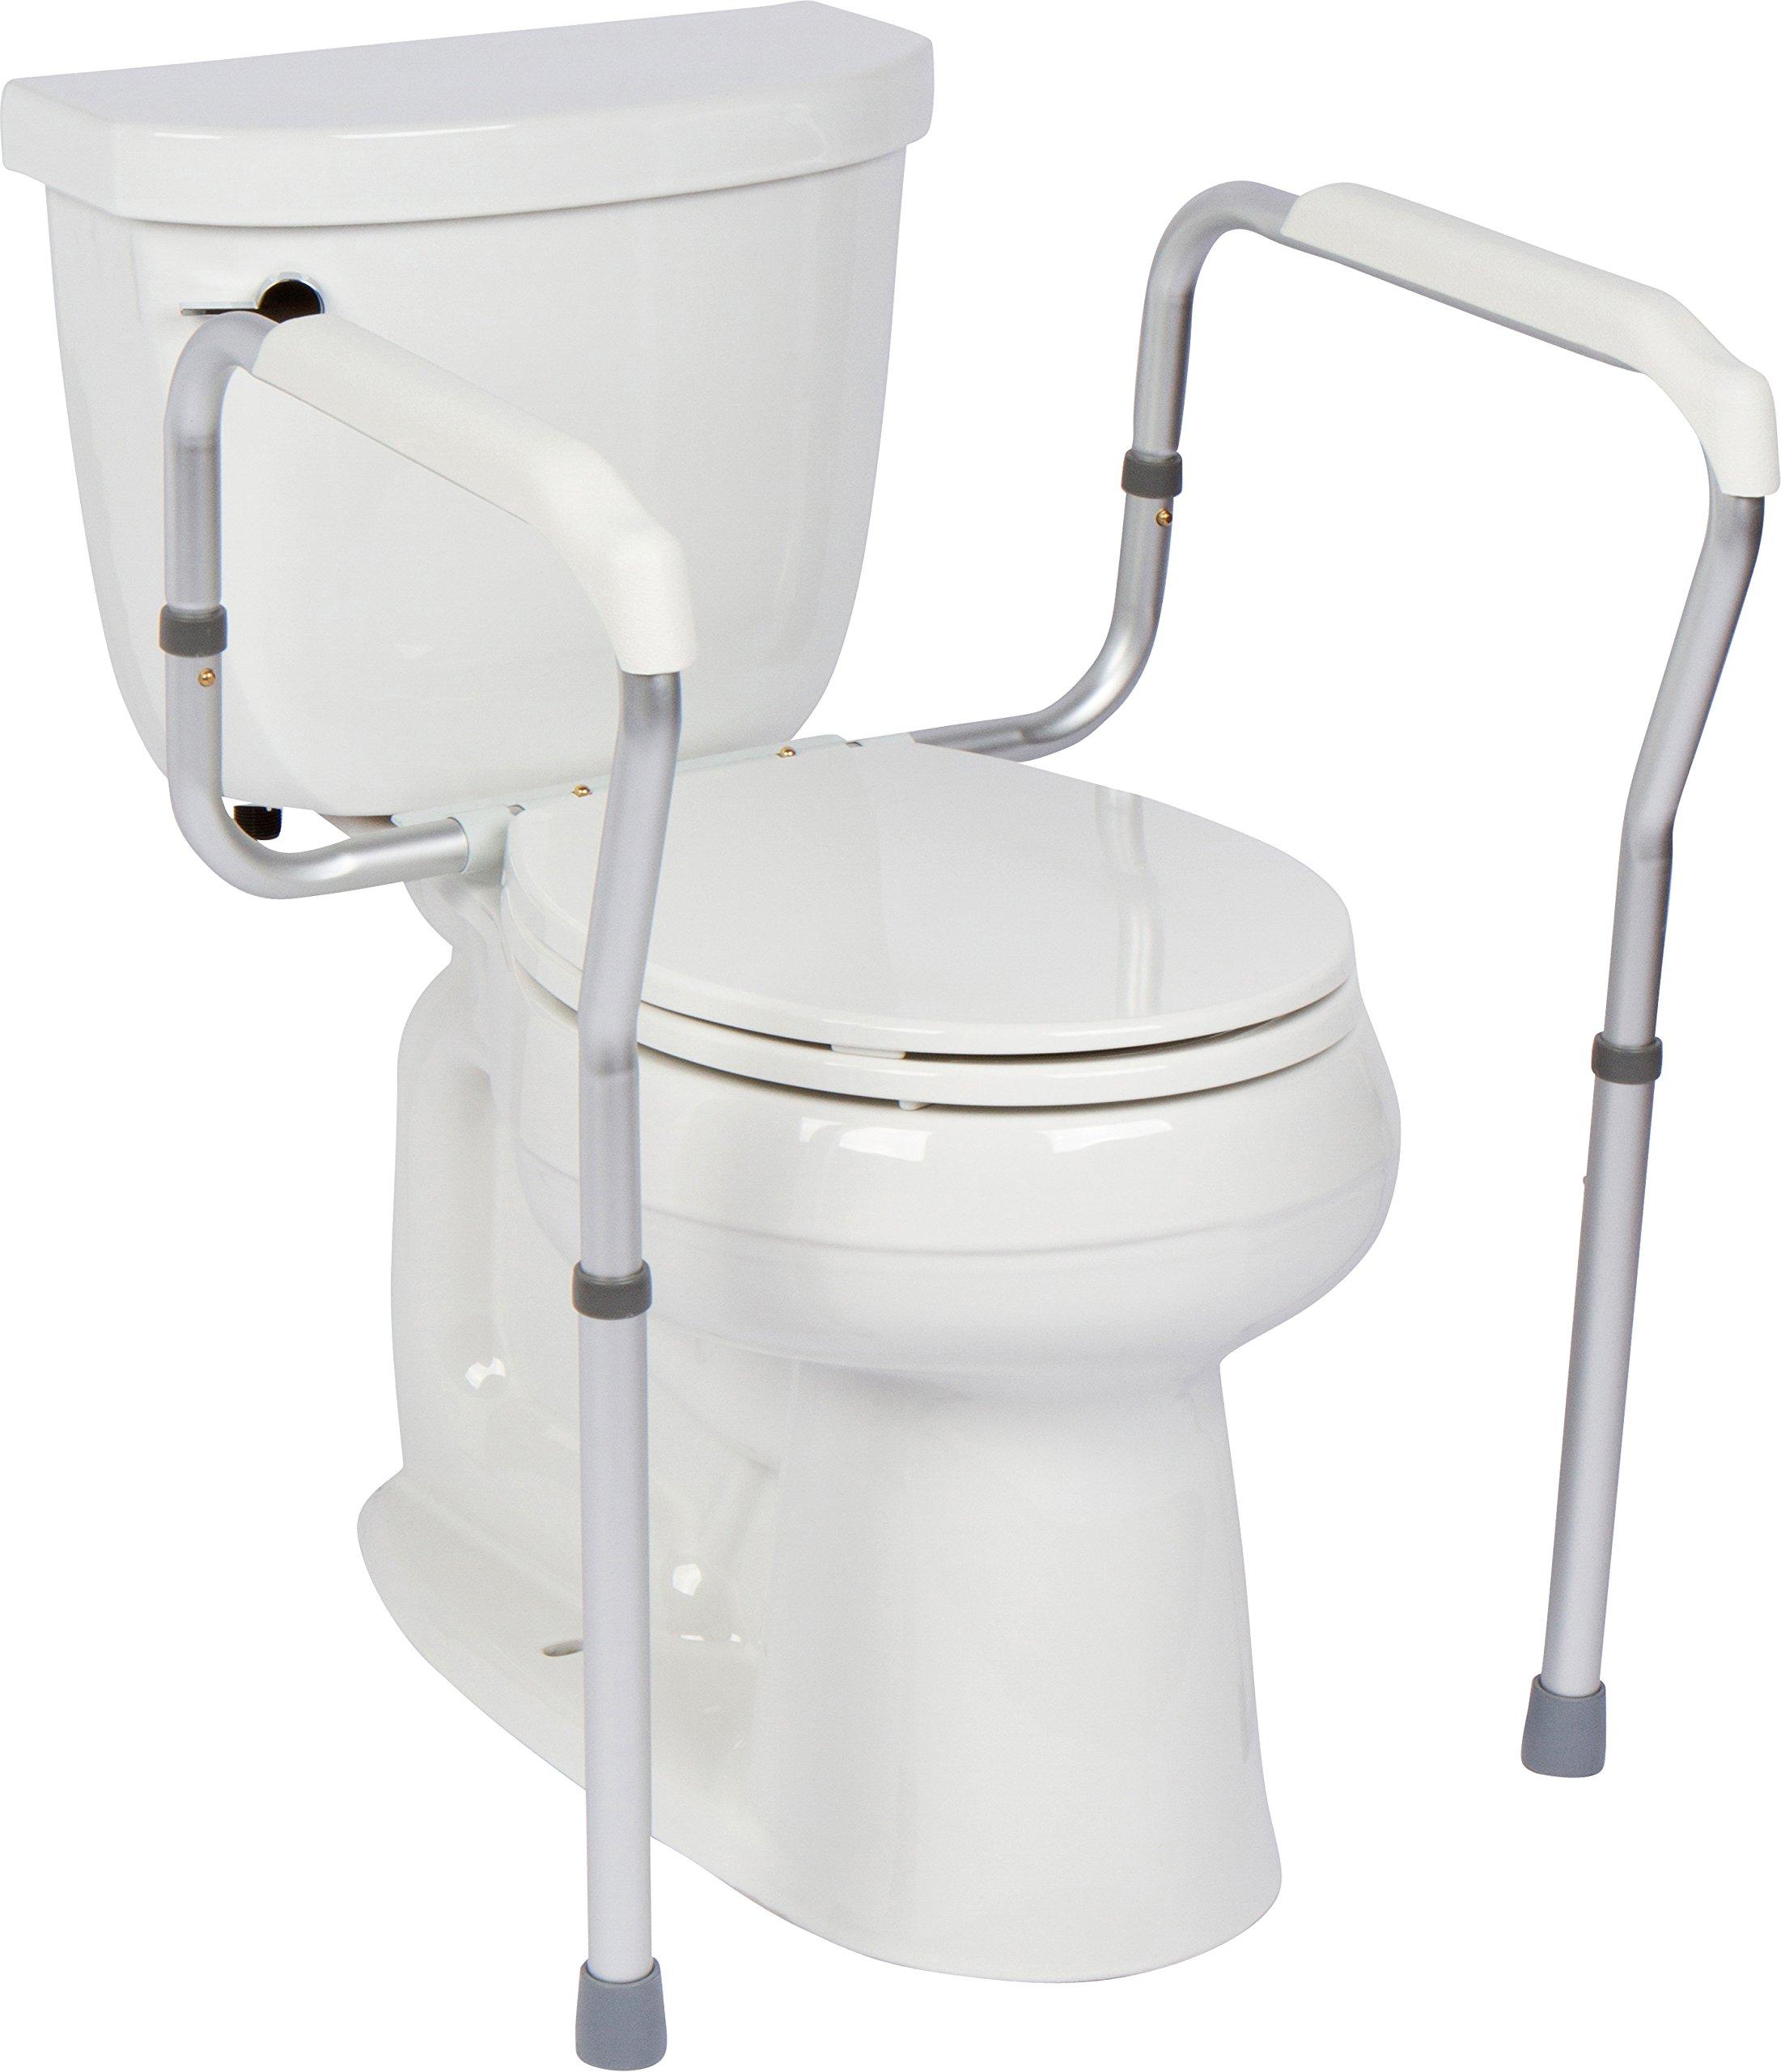 Casiva Premium Toilet Safety Rail